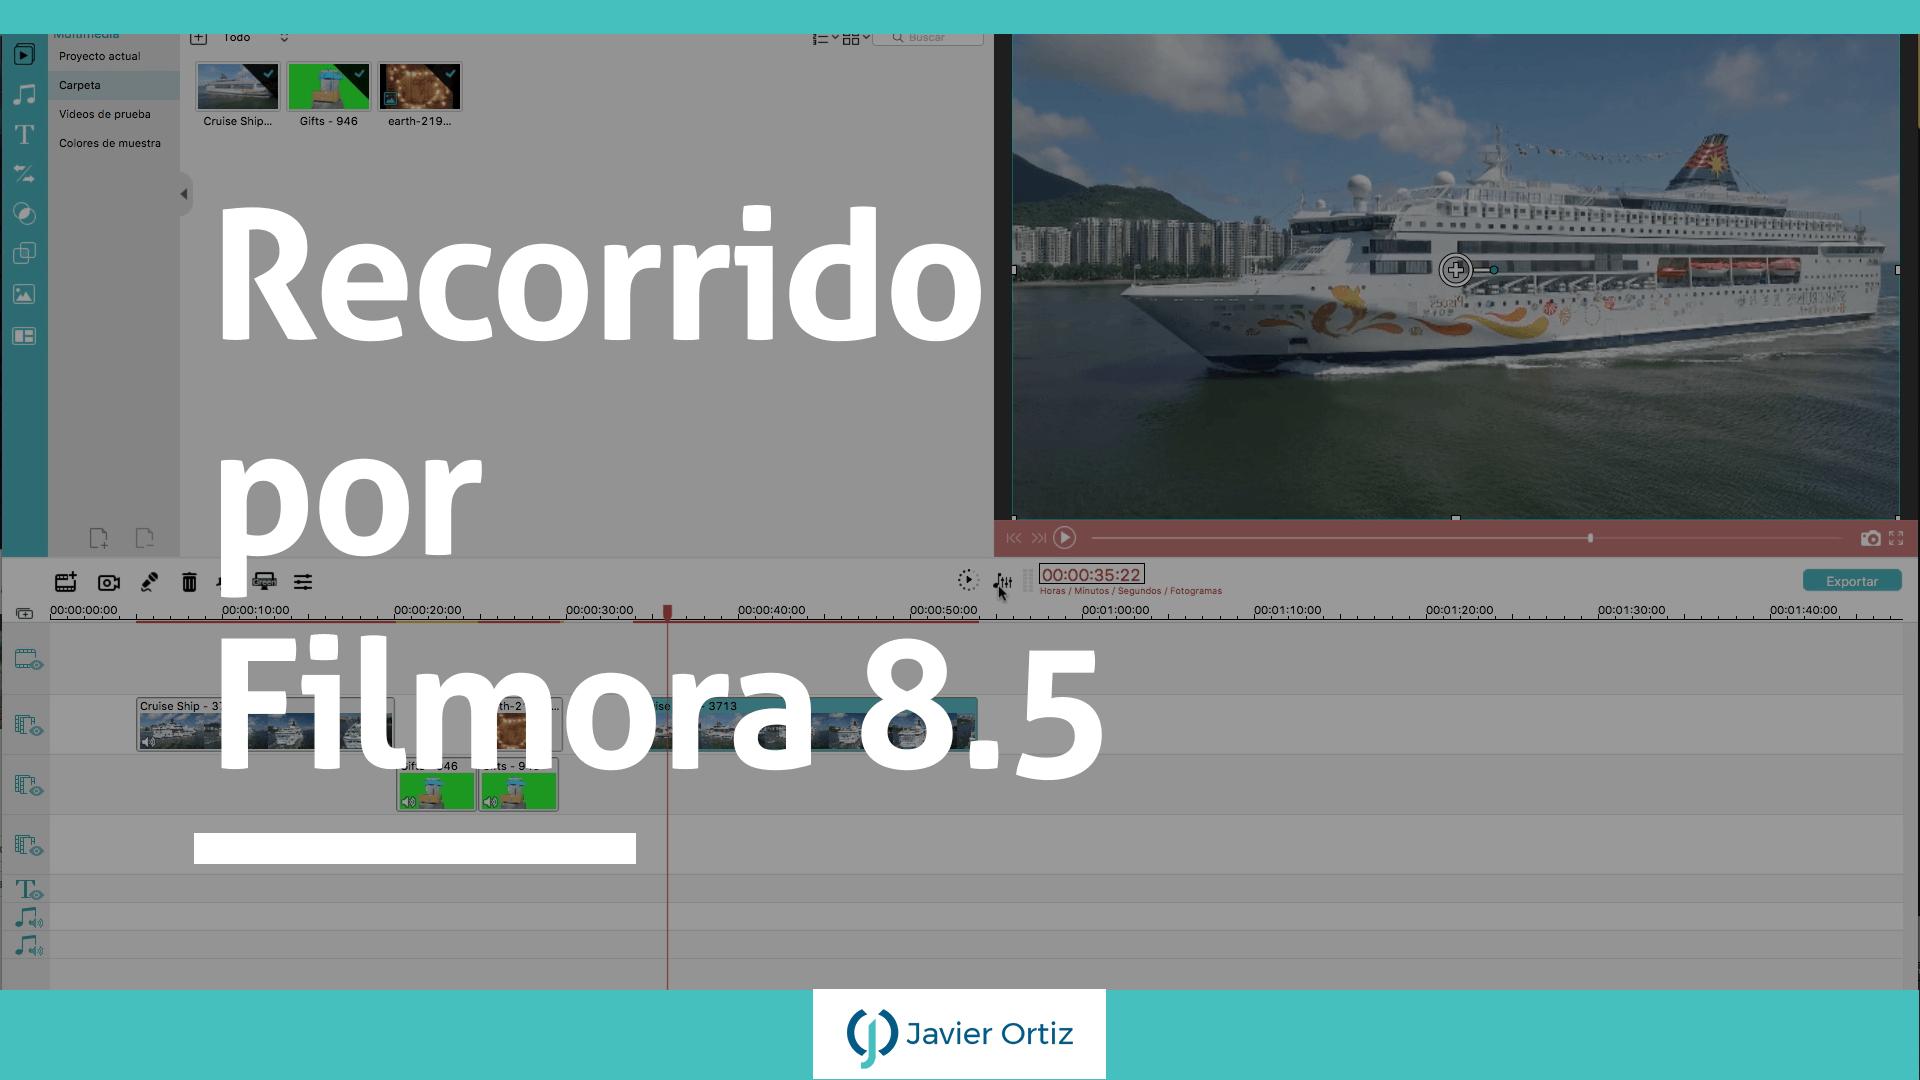 Filmora 8.5 - editor de video